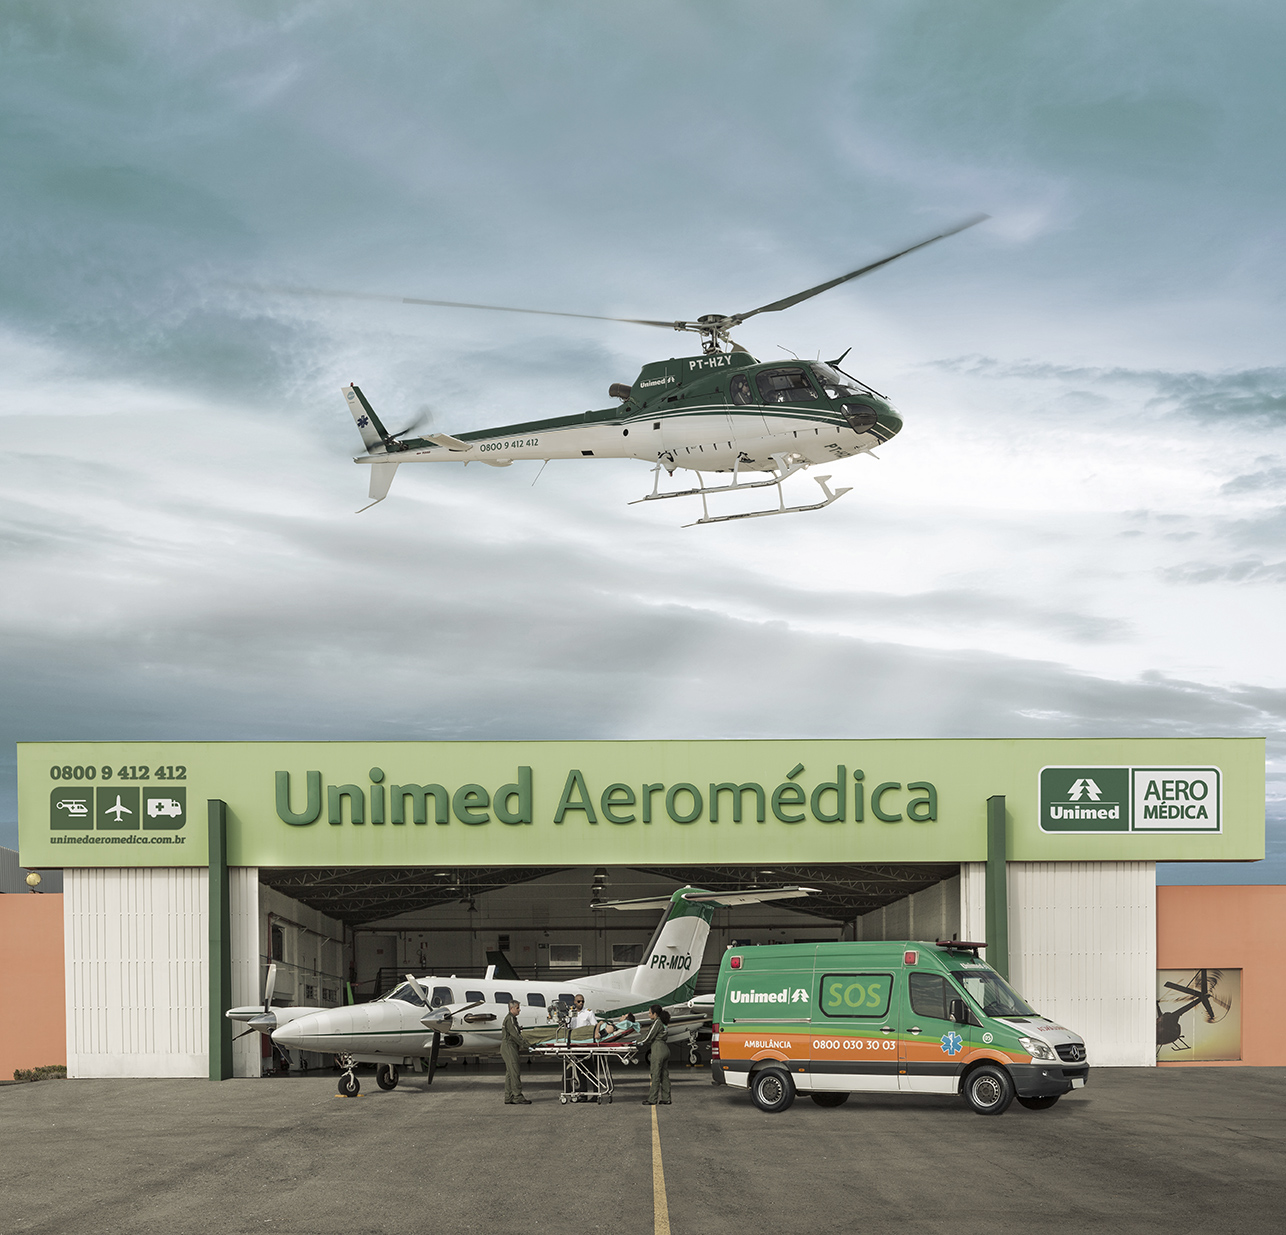 Unimed Aeromédica